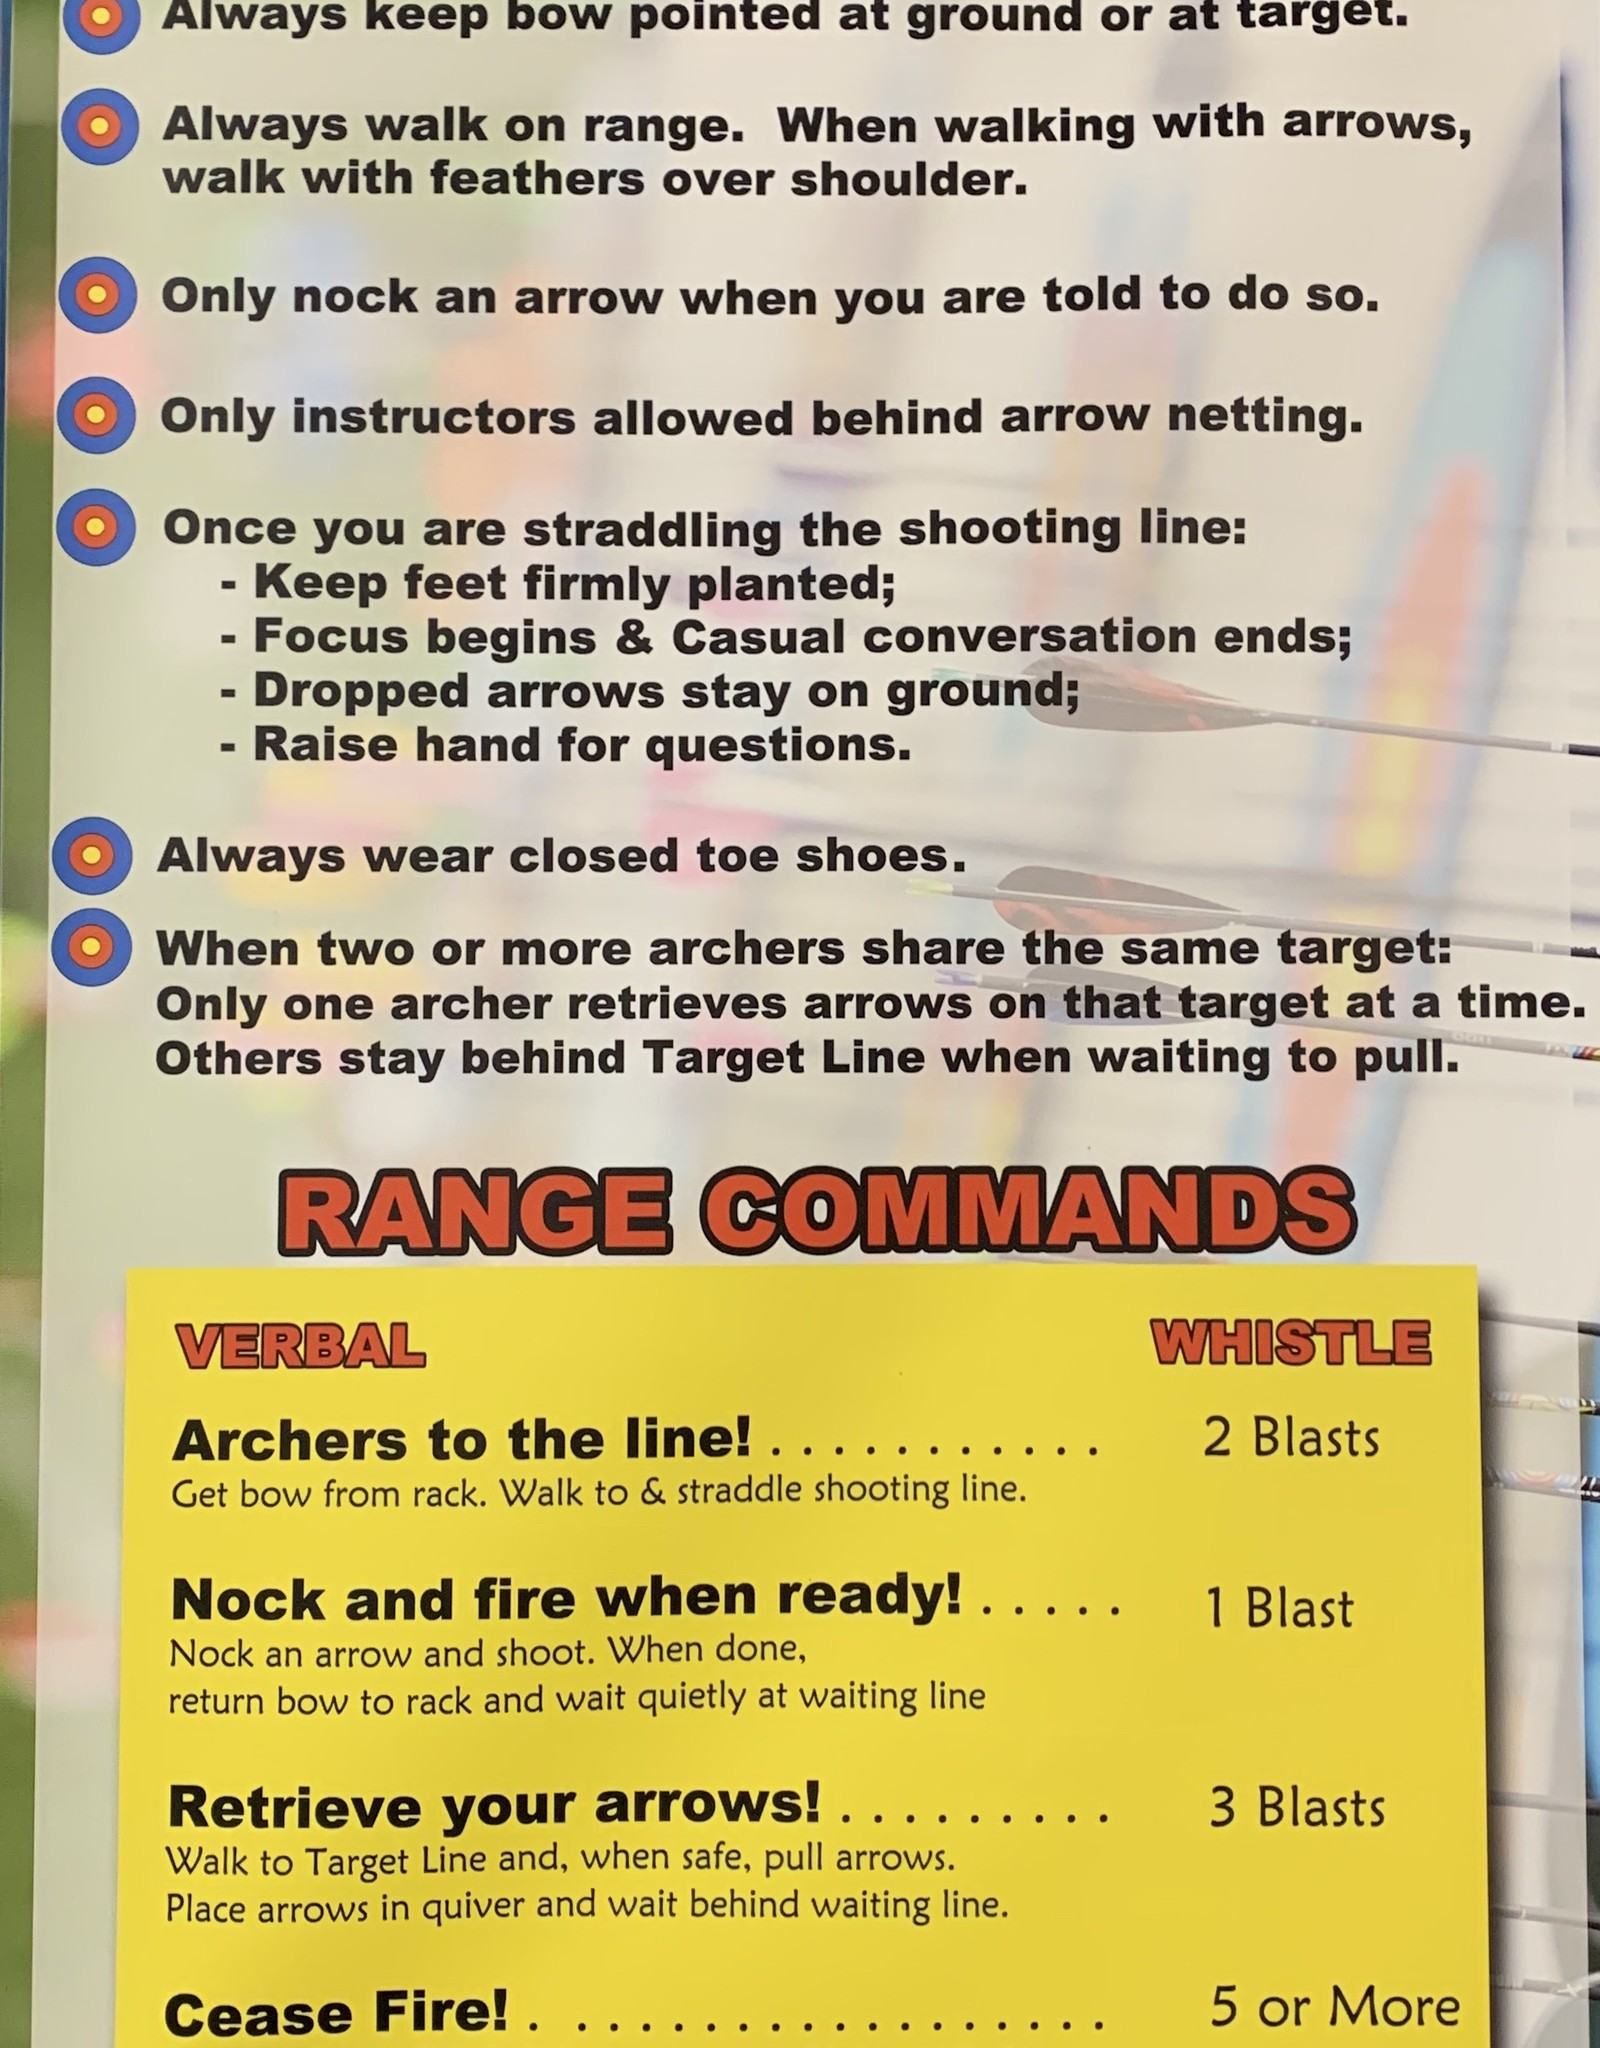 Dragonfly Archery Archery Range Rules Poster